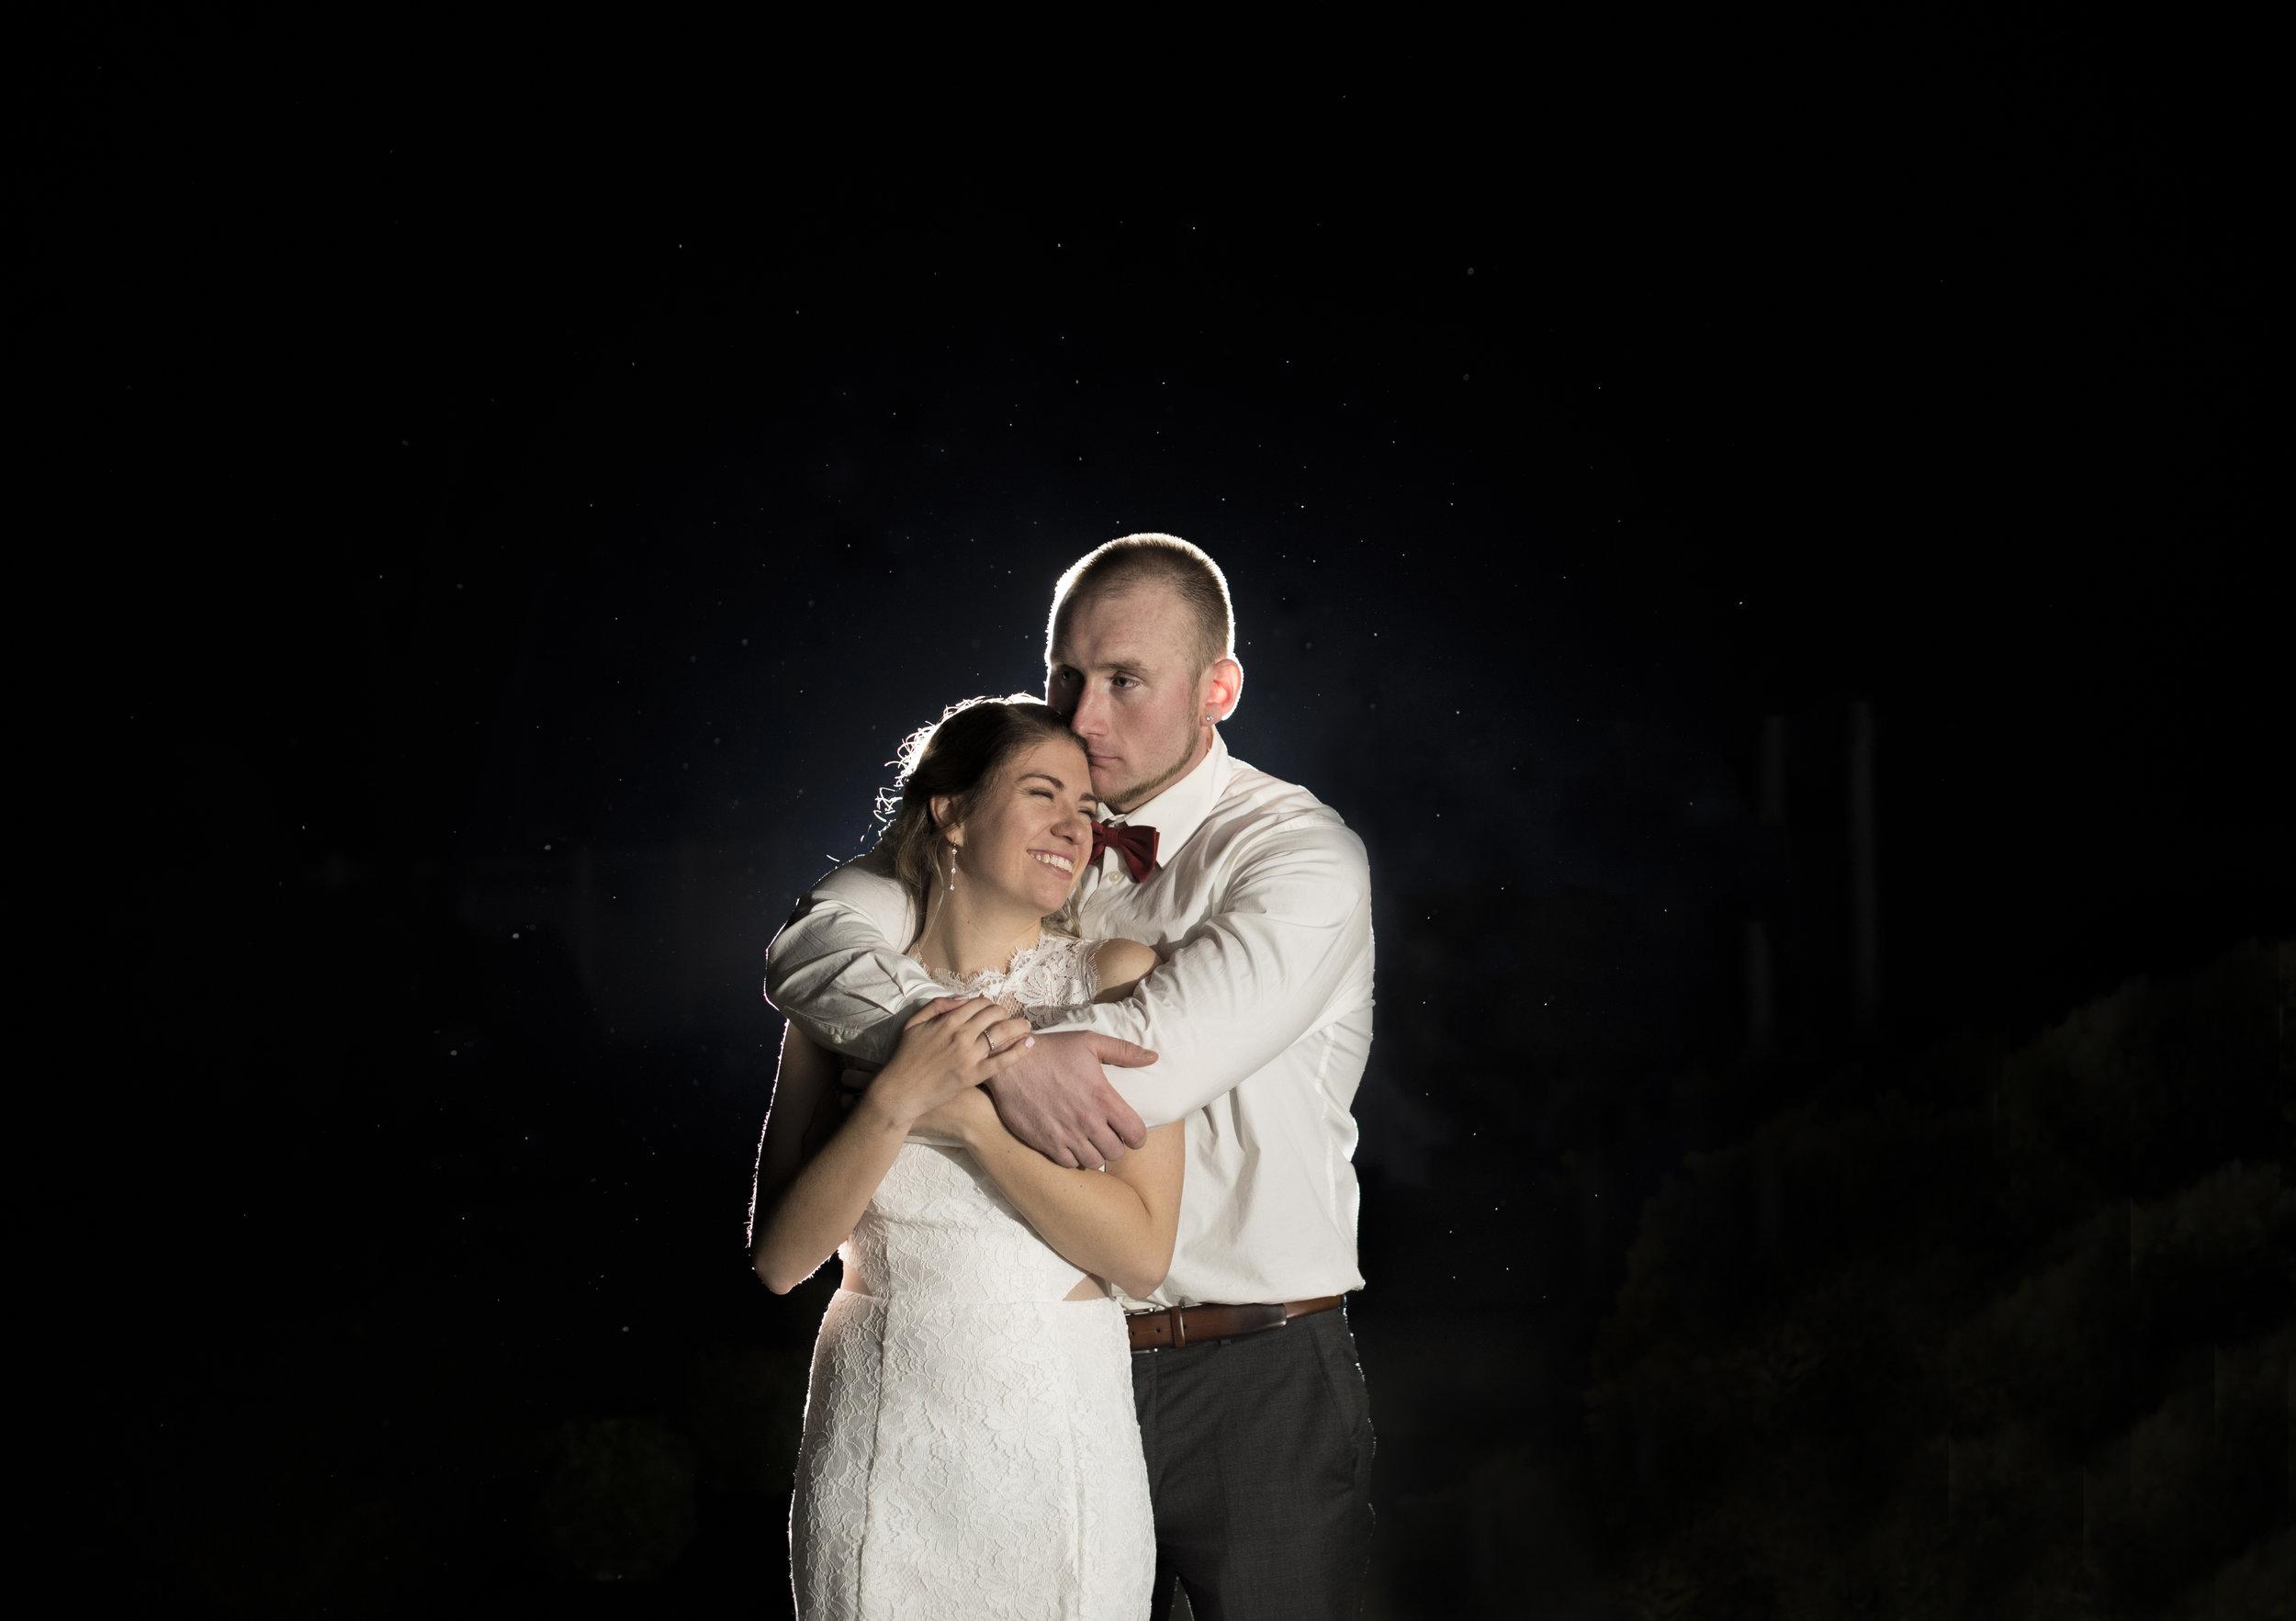 south-jersey-wedding-photographer.jpg